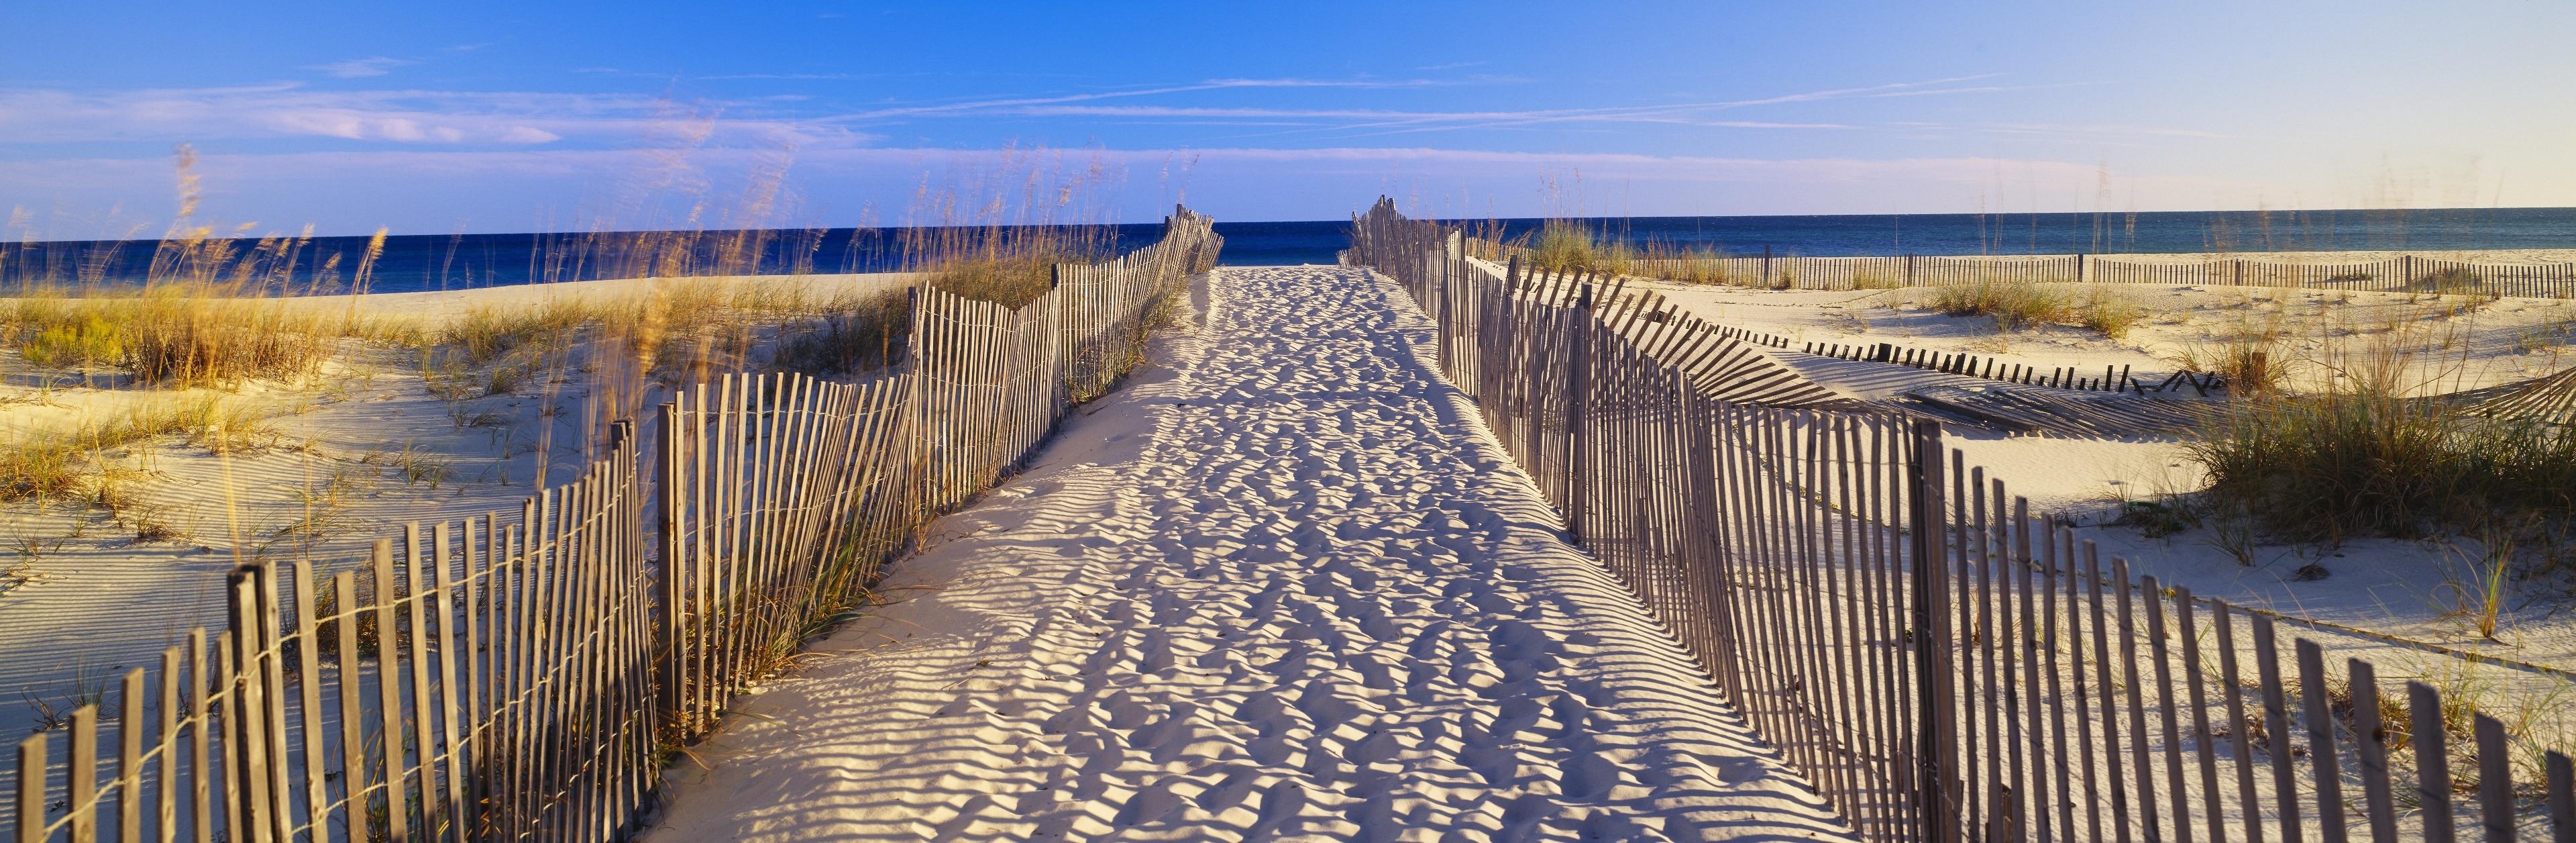 Blue Mountain Beach, Santa Rosa Beach, Florida, United States of America